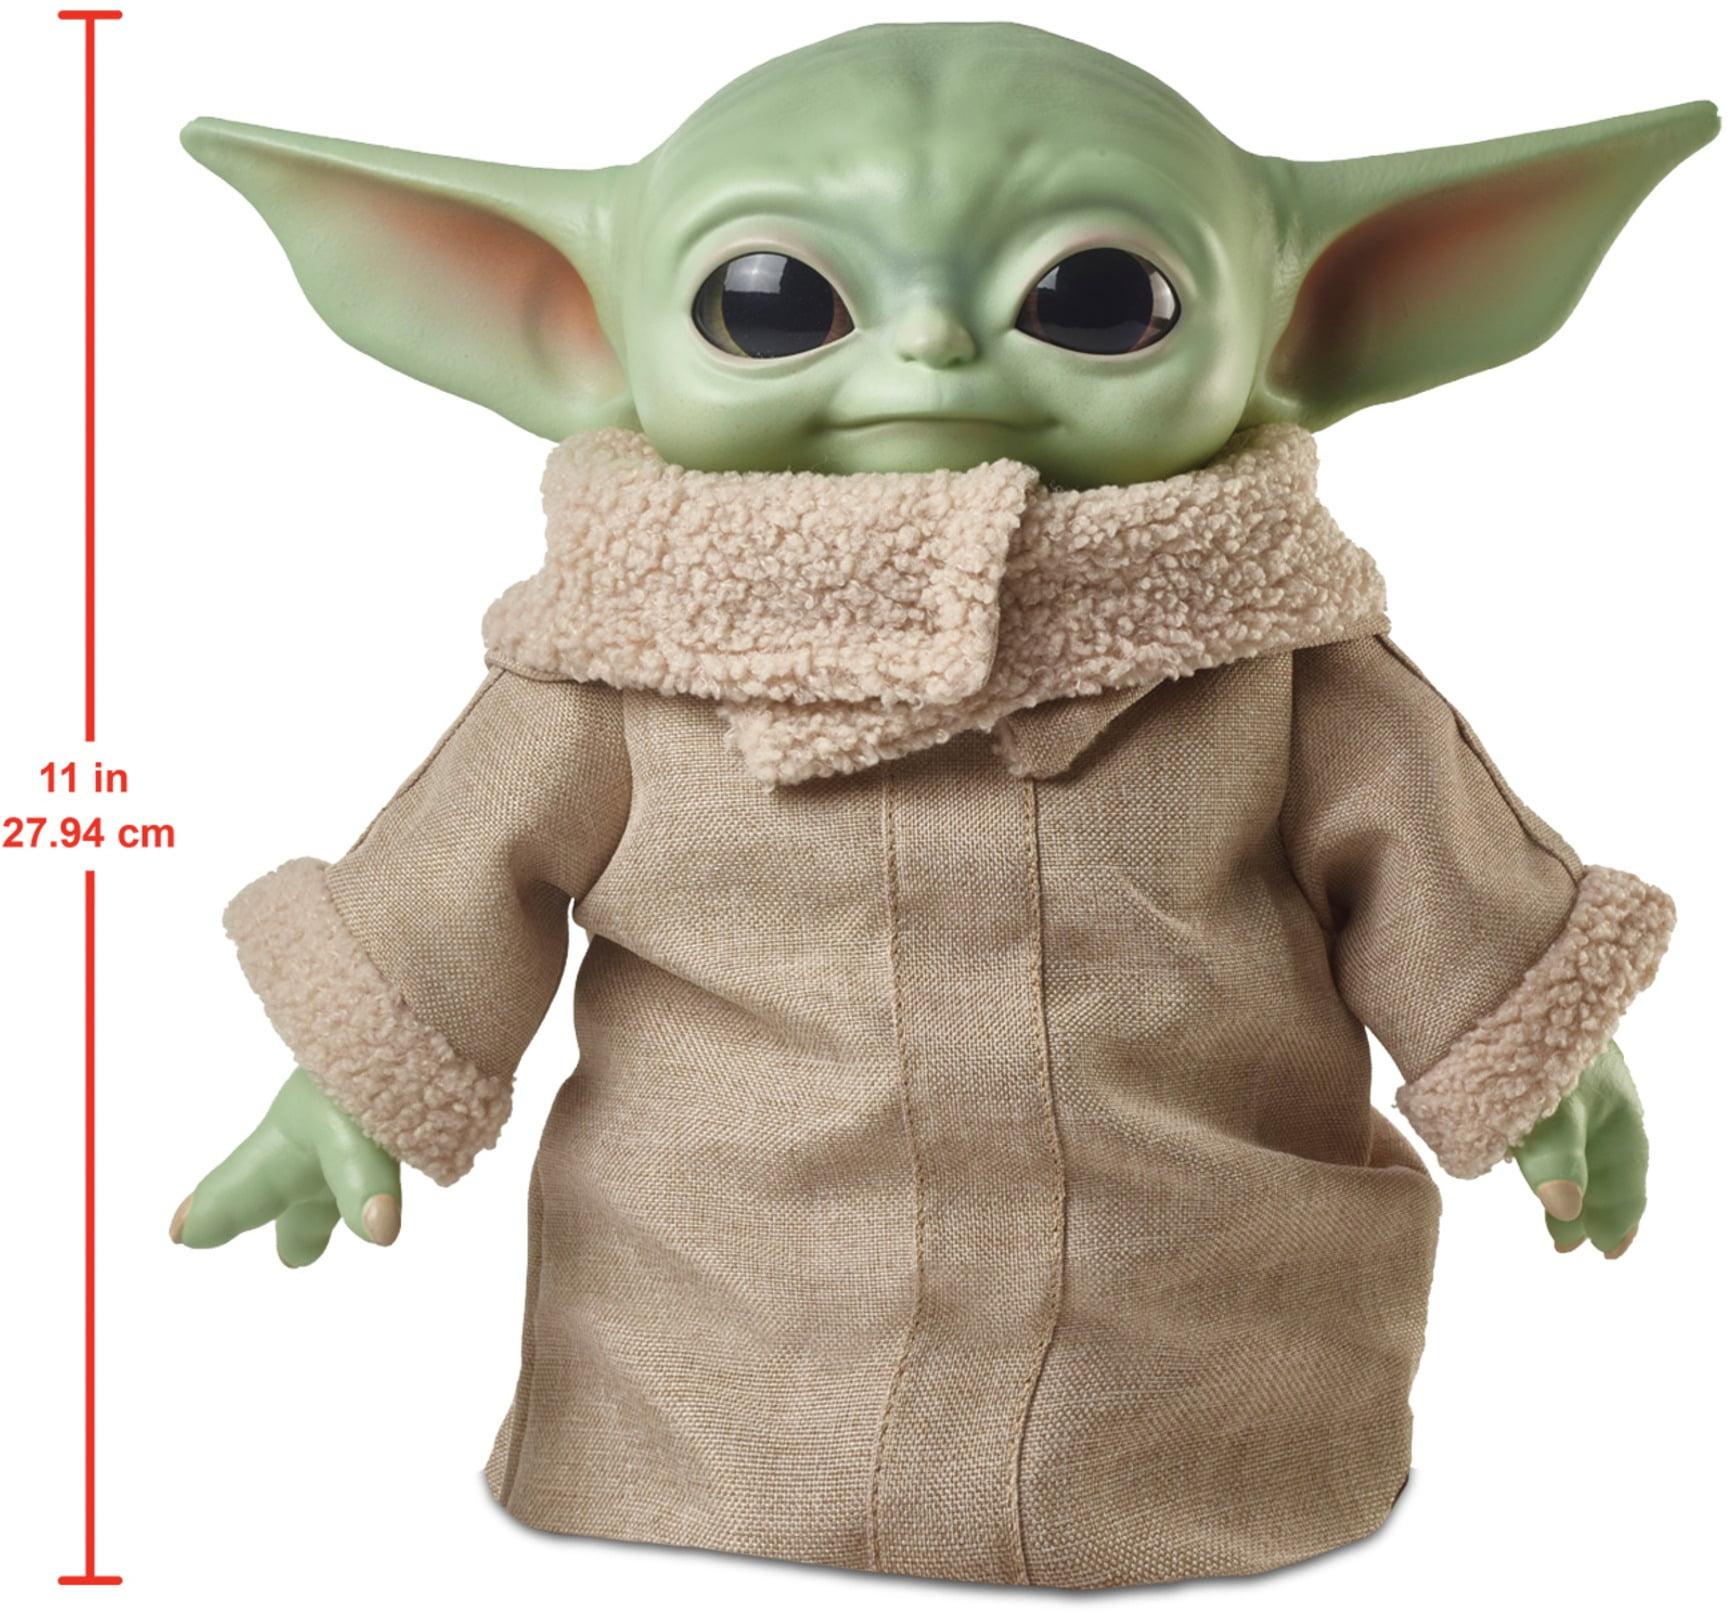 The Child Baby Yoda Plush Star Wars Knob Frog Necklace Mandalorian 2 11 Costco